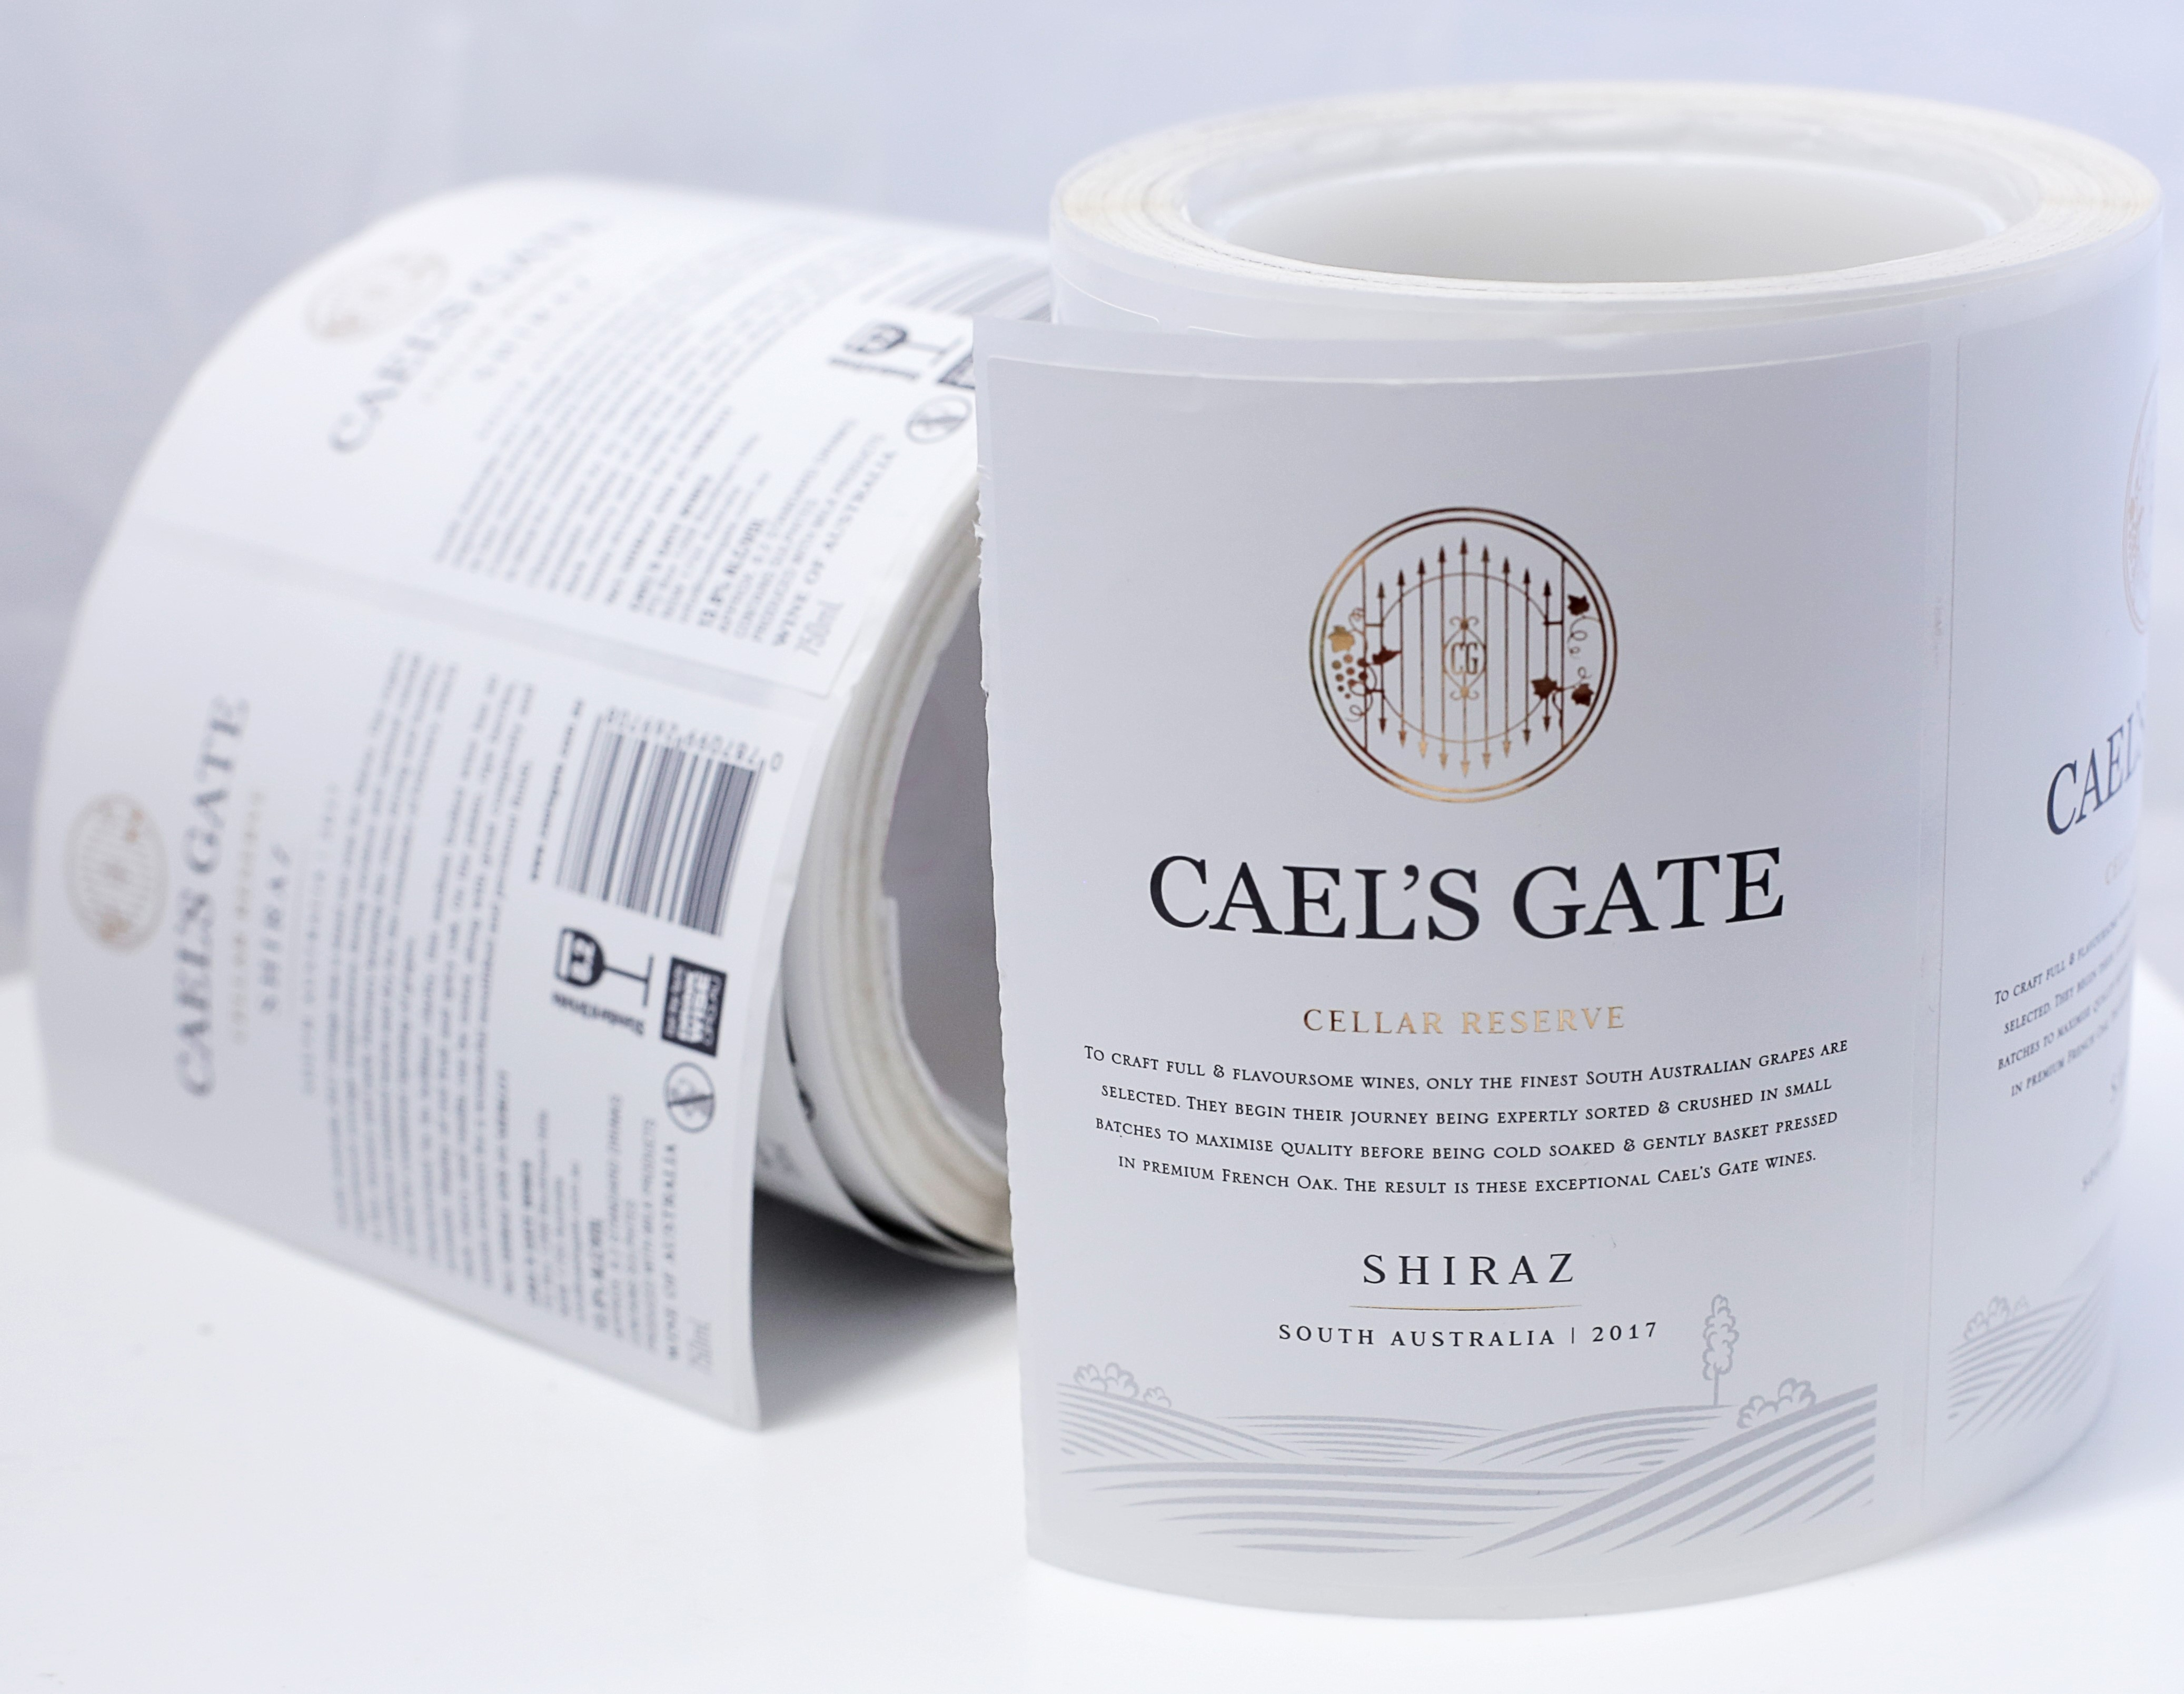 Caels Gate Wine Labels